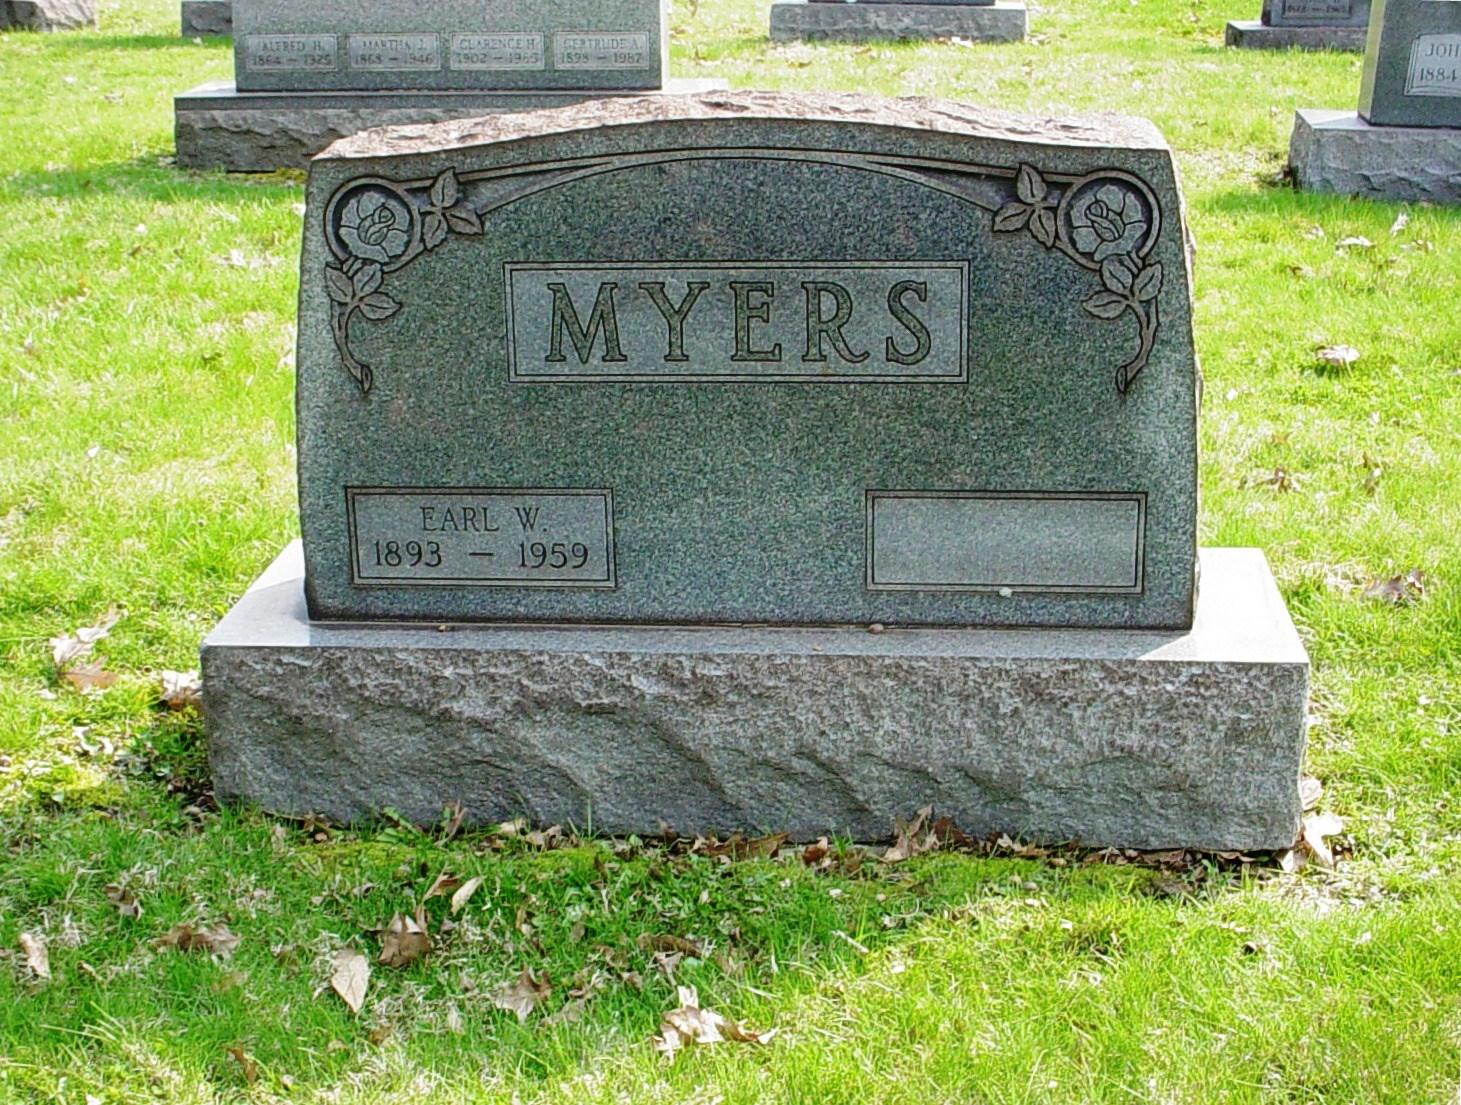 Earl B Myers